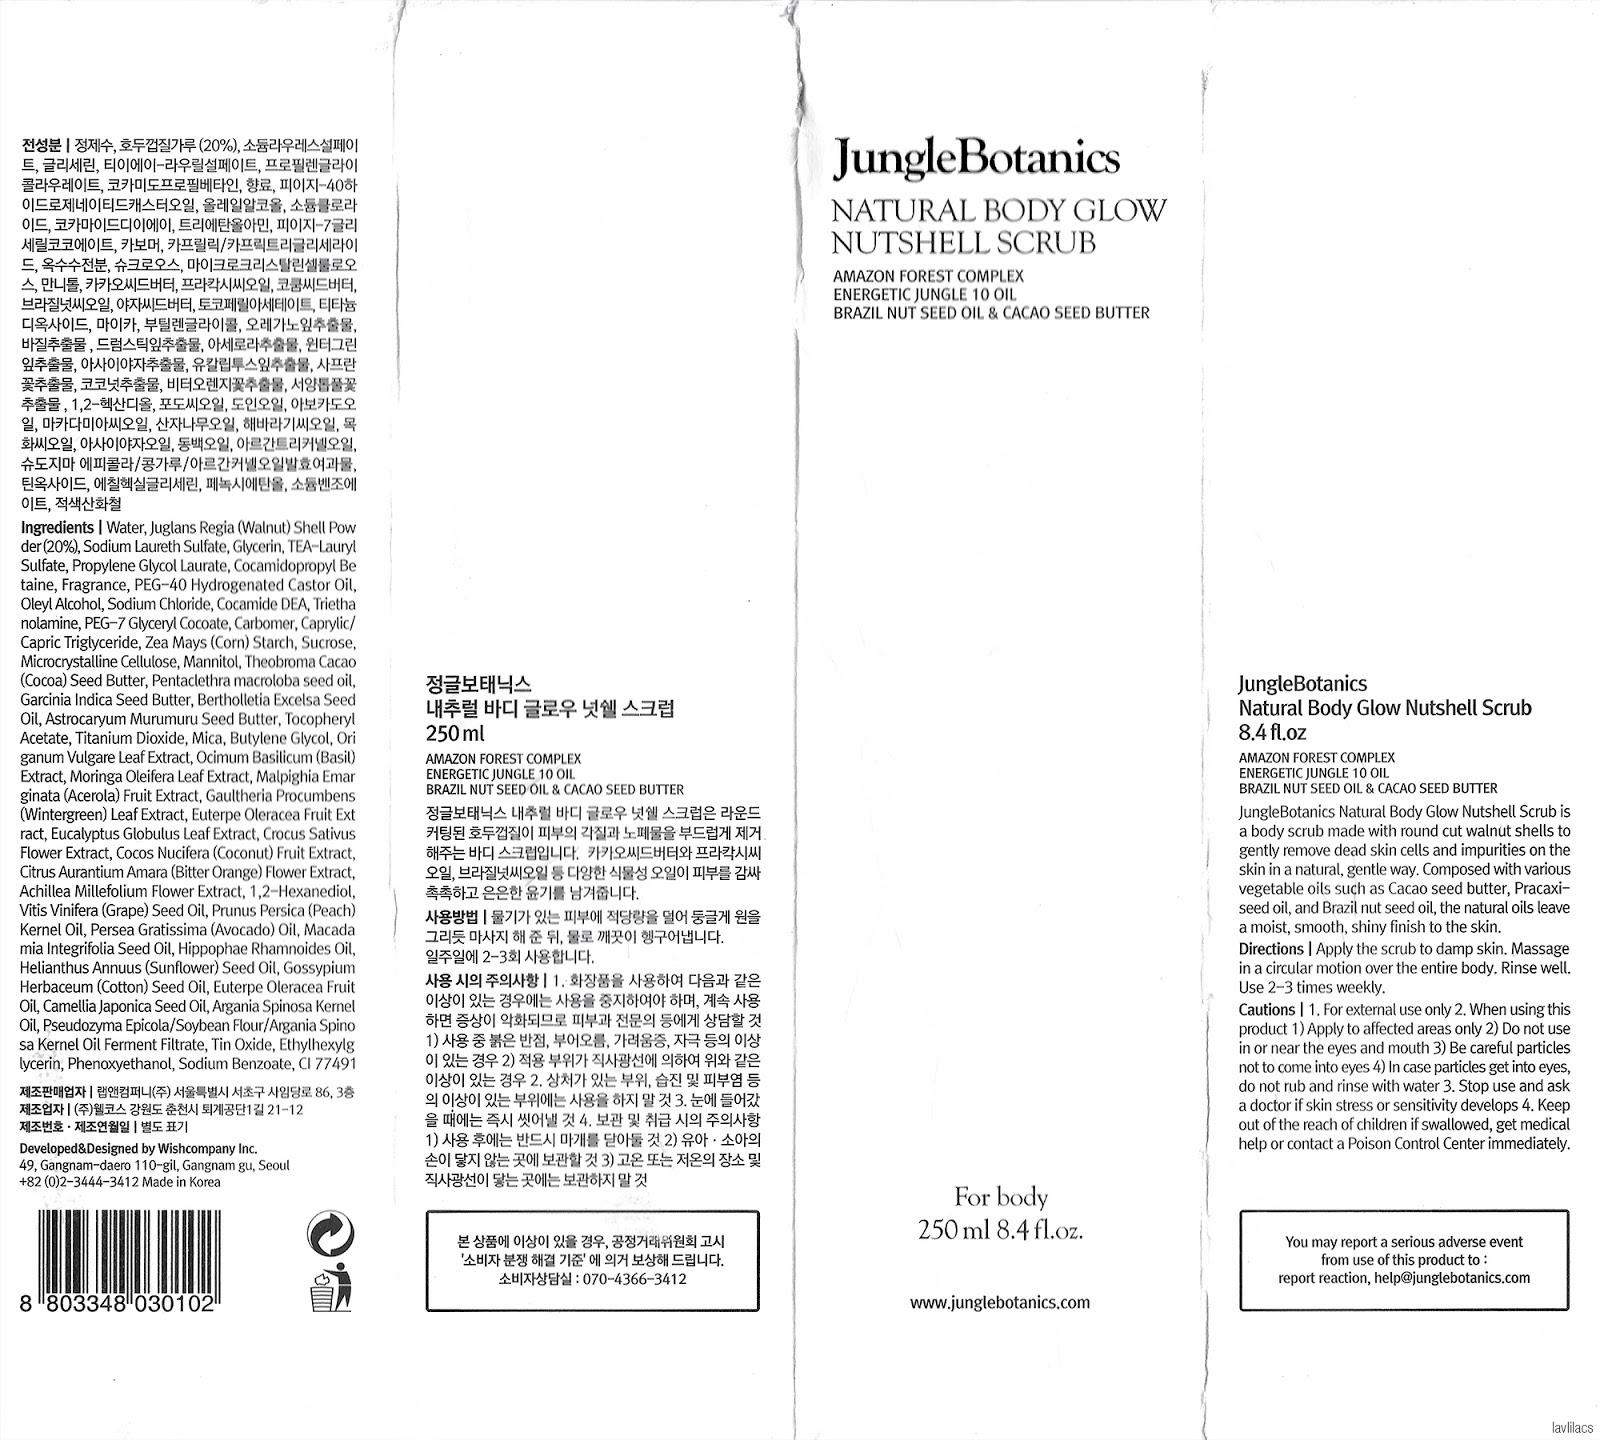 lavlilacs Jungle Botanics Natural Body Glow Nutshell Scrub packaging inregients description